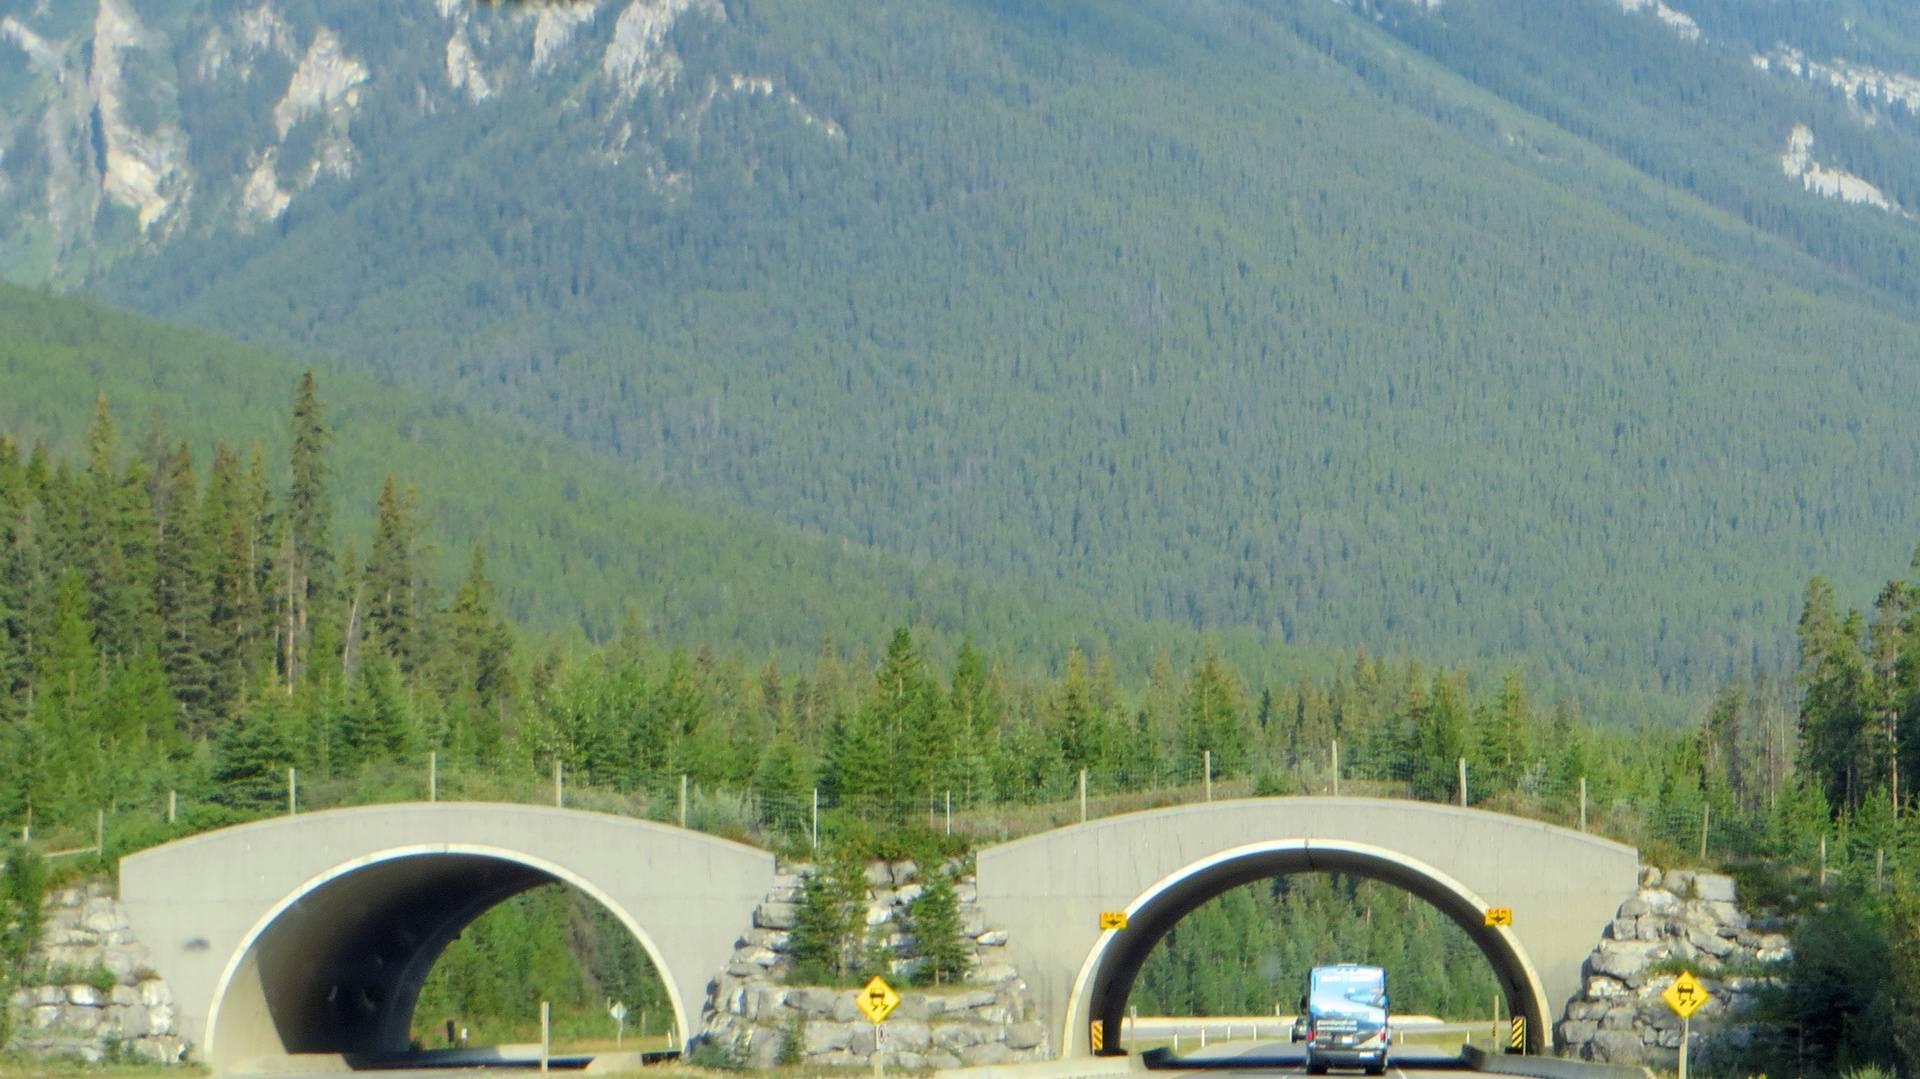 Wildlife bridge in Banff National Park